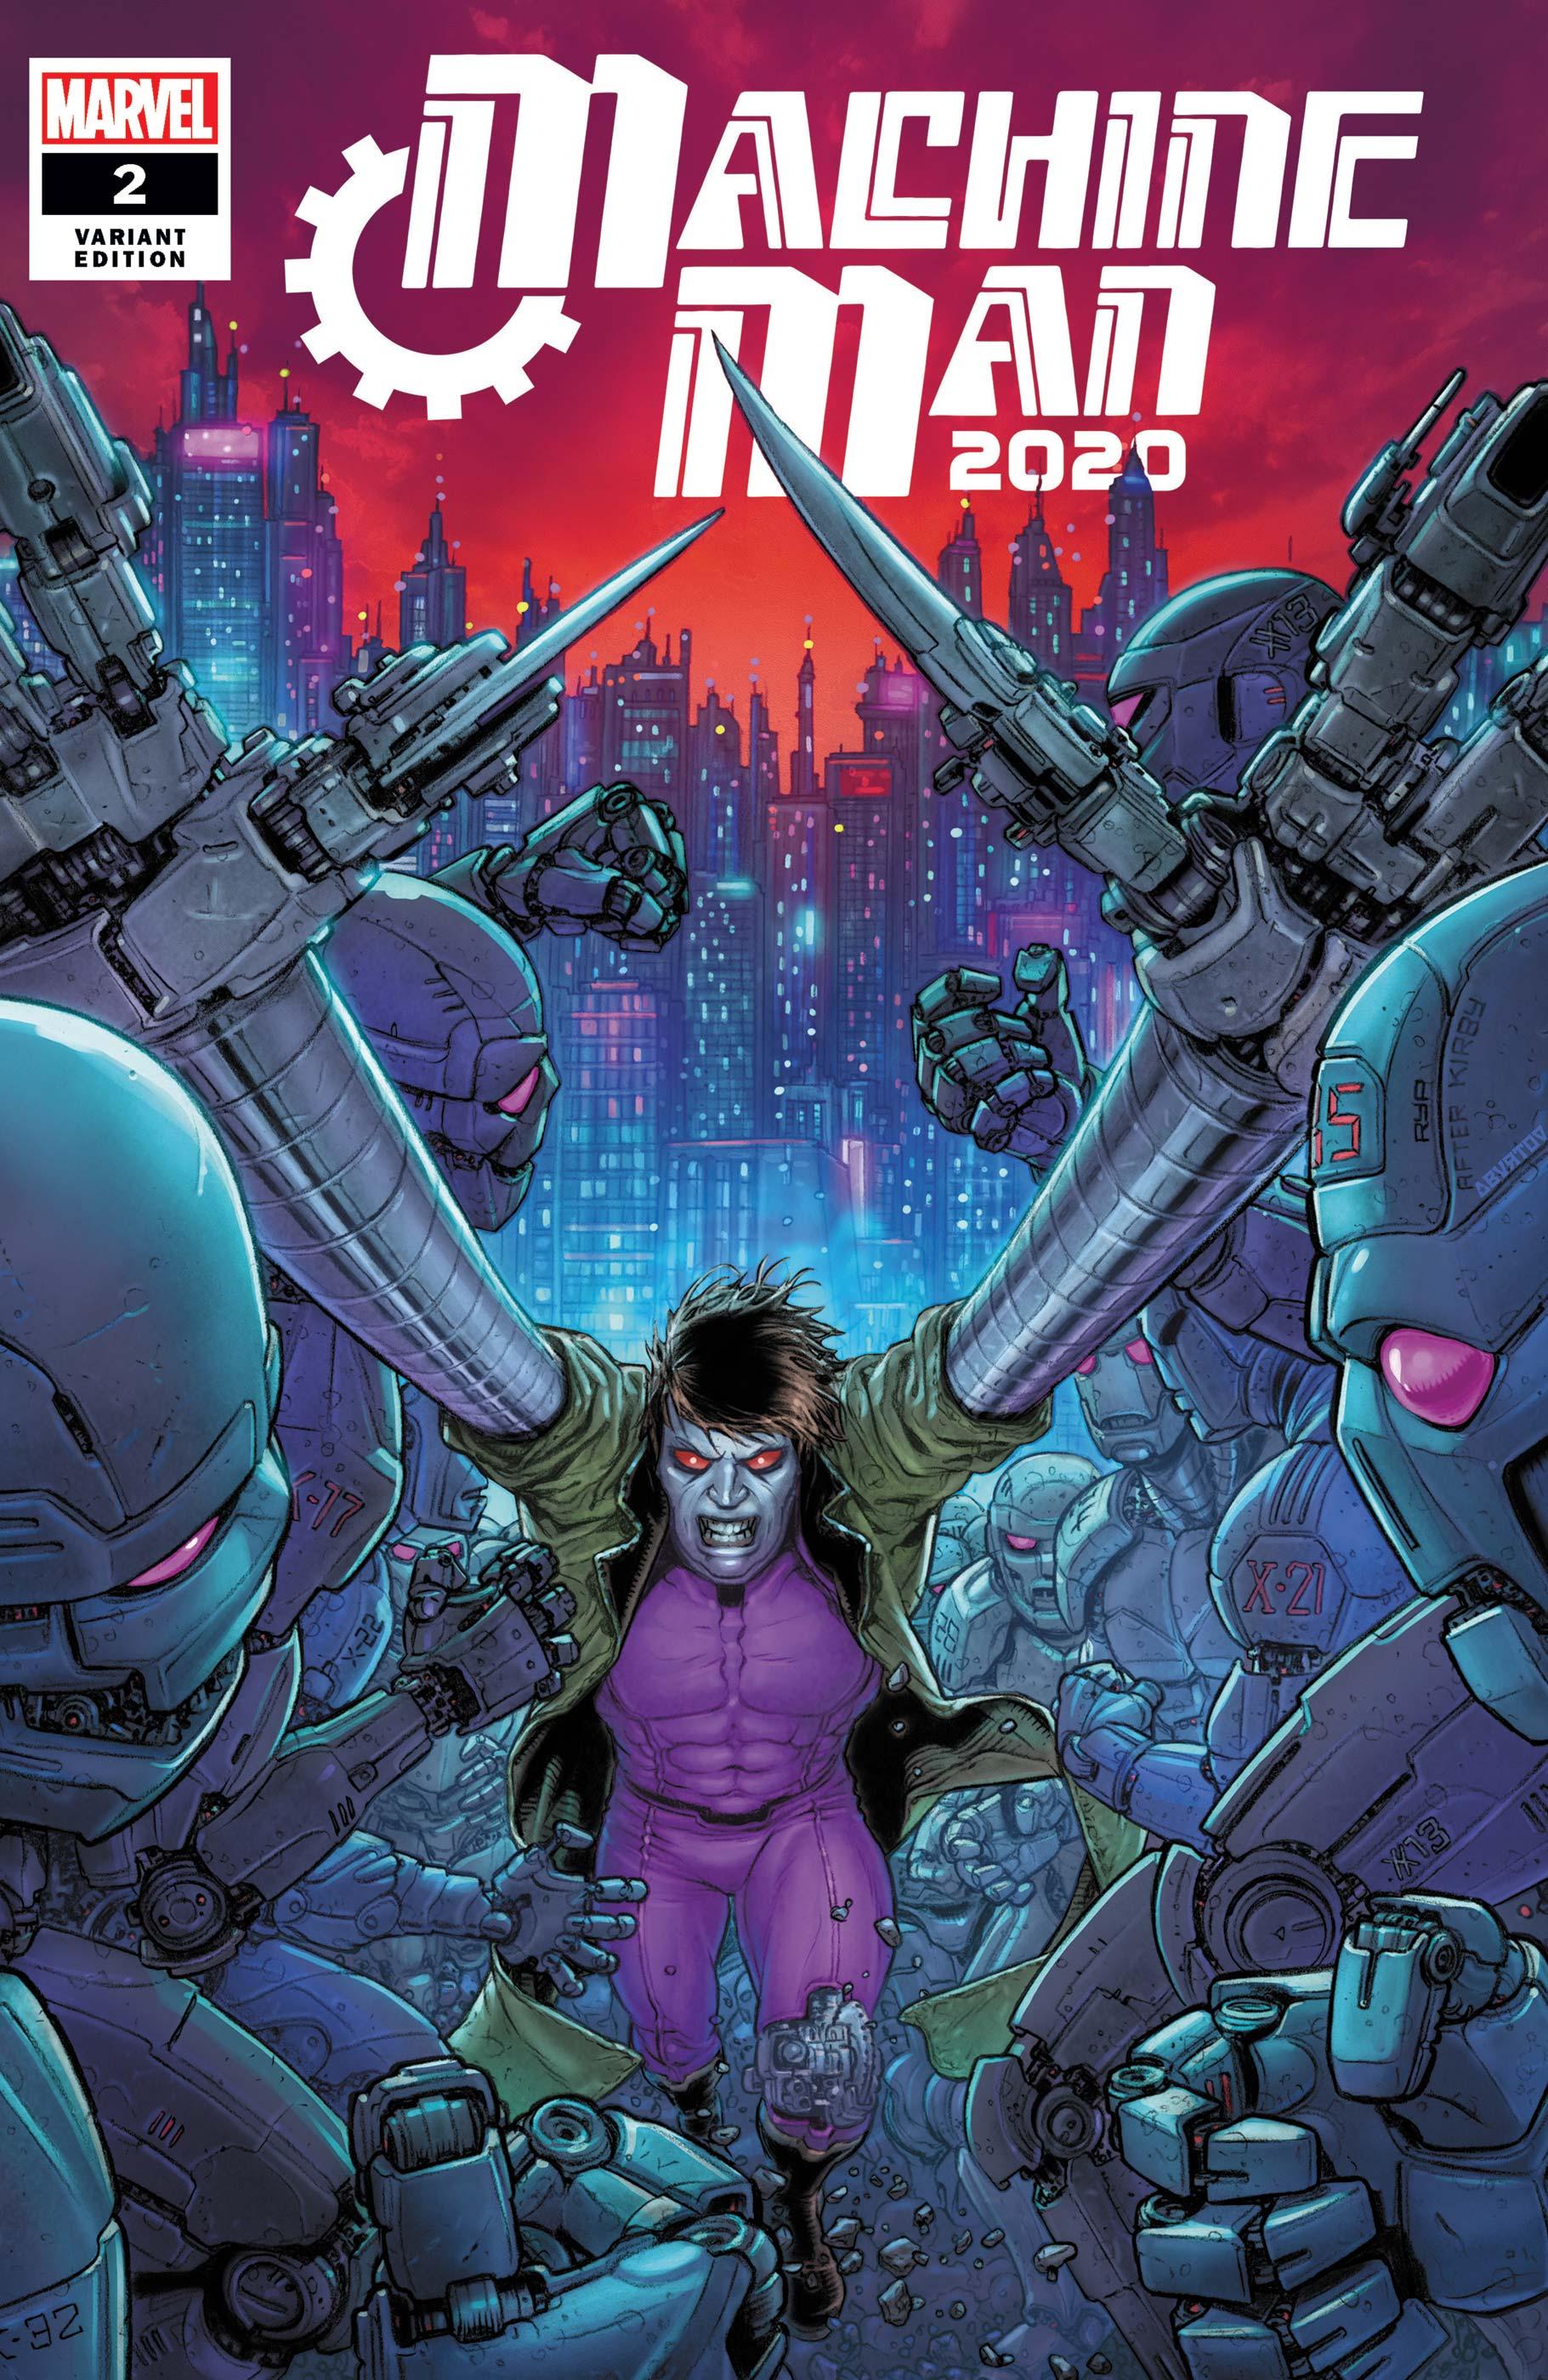 2020 Machine Man (2020) #2 (Variant)